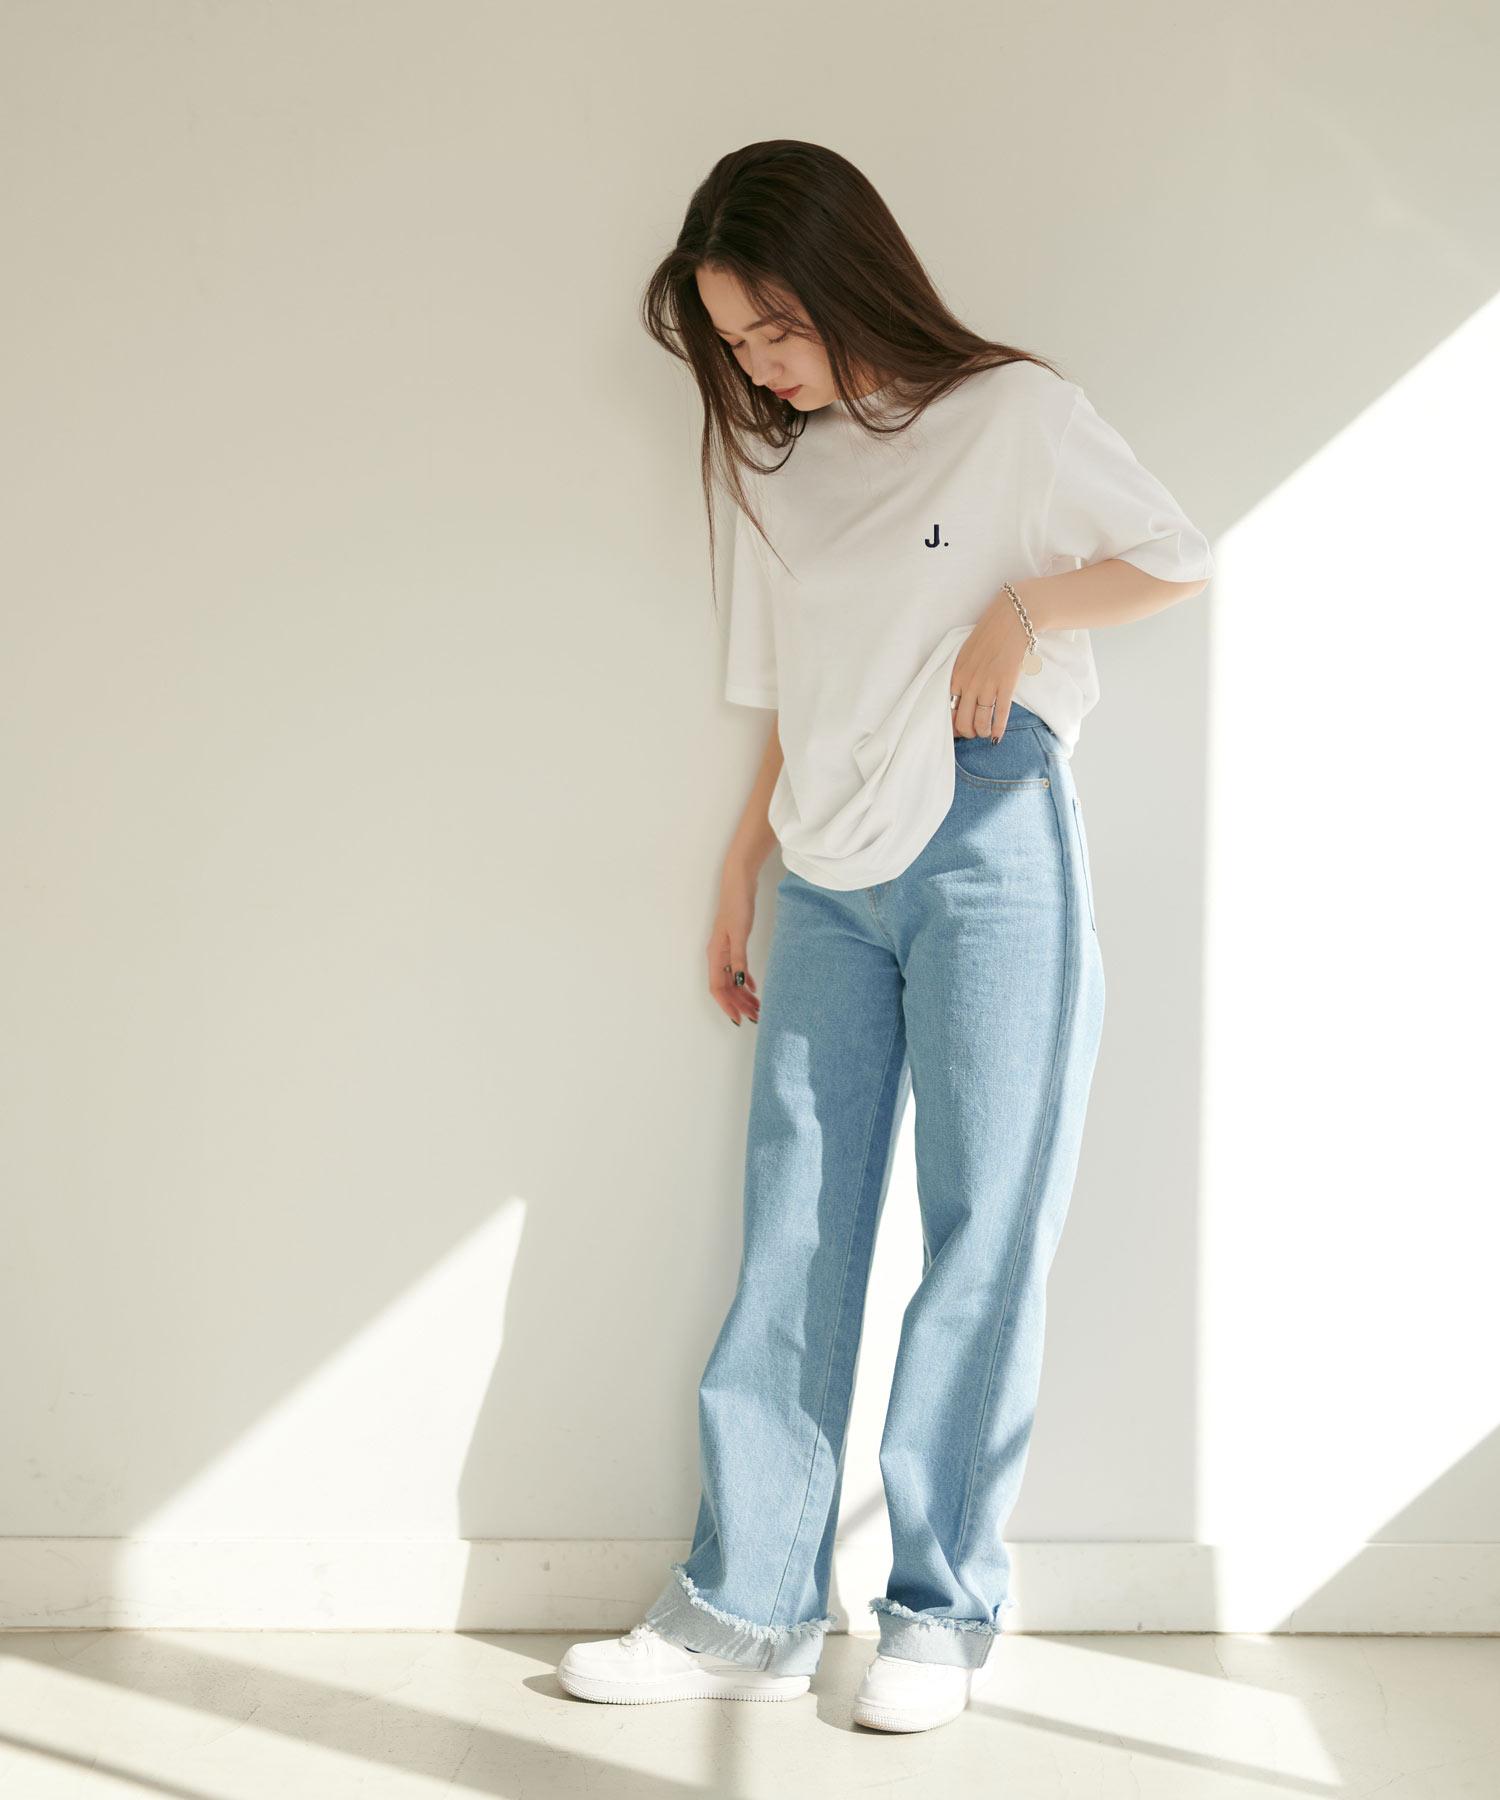 J.刺繍ユニセックスTシャツ TINA:JOJUN